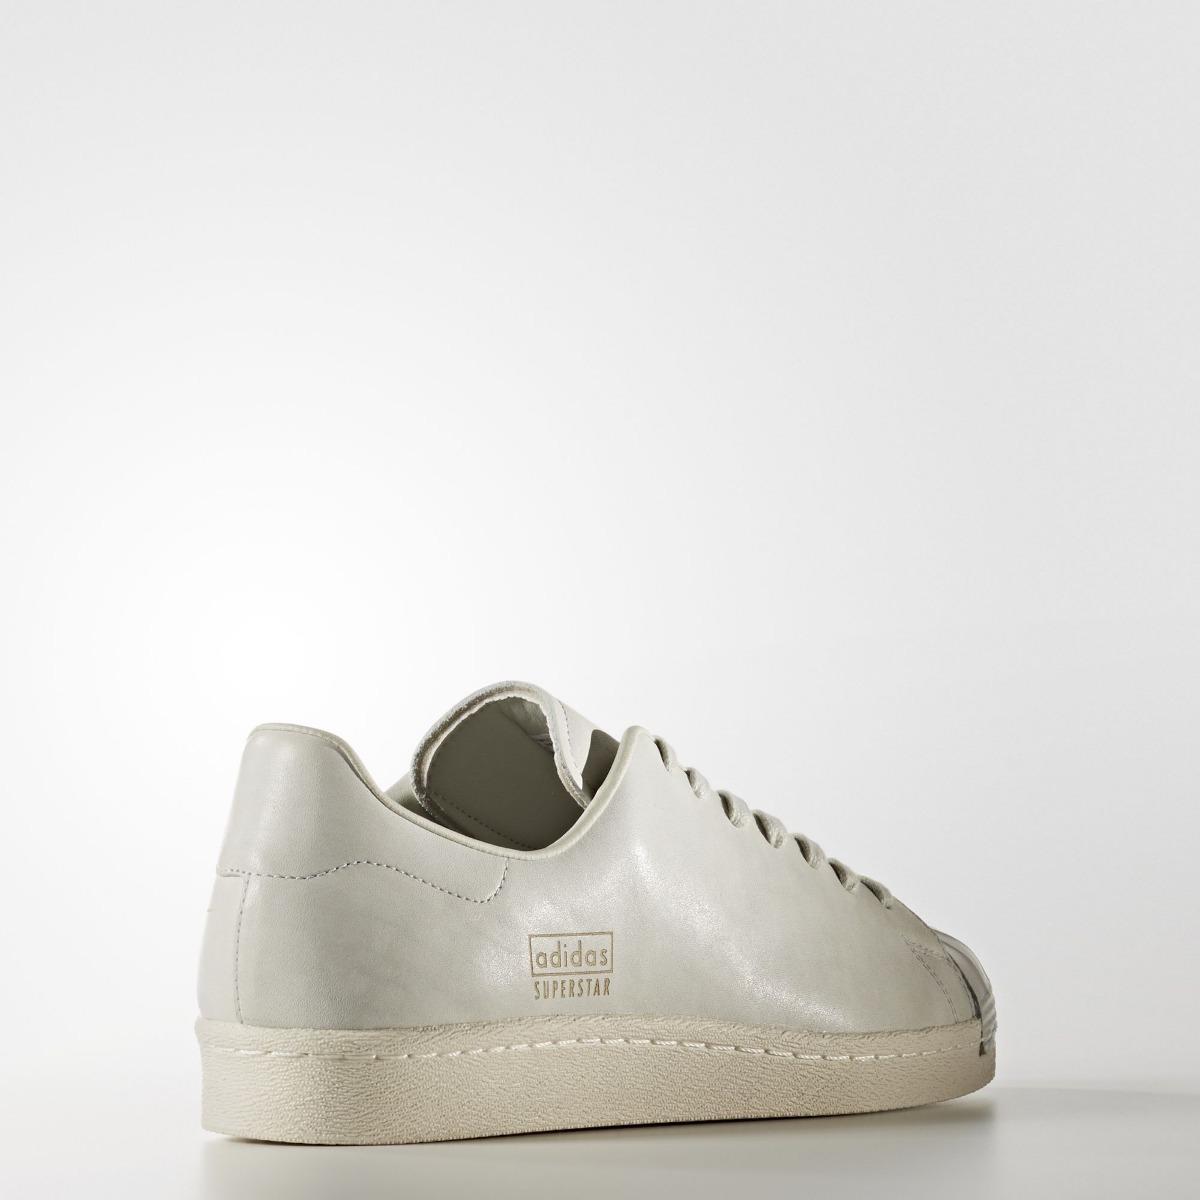 brand new 5f0e3 19c05 Tenis Superstar 80's Clean adidas Originals Bb0169